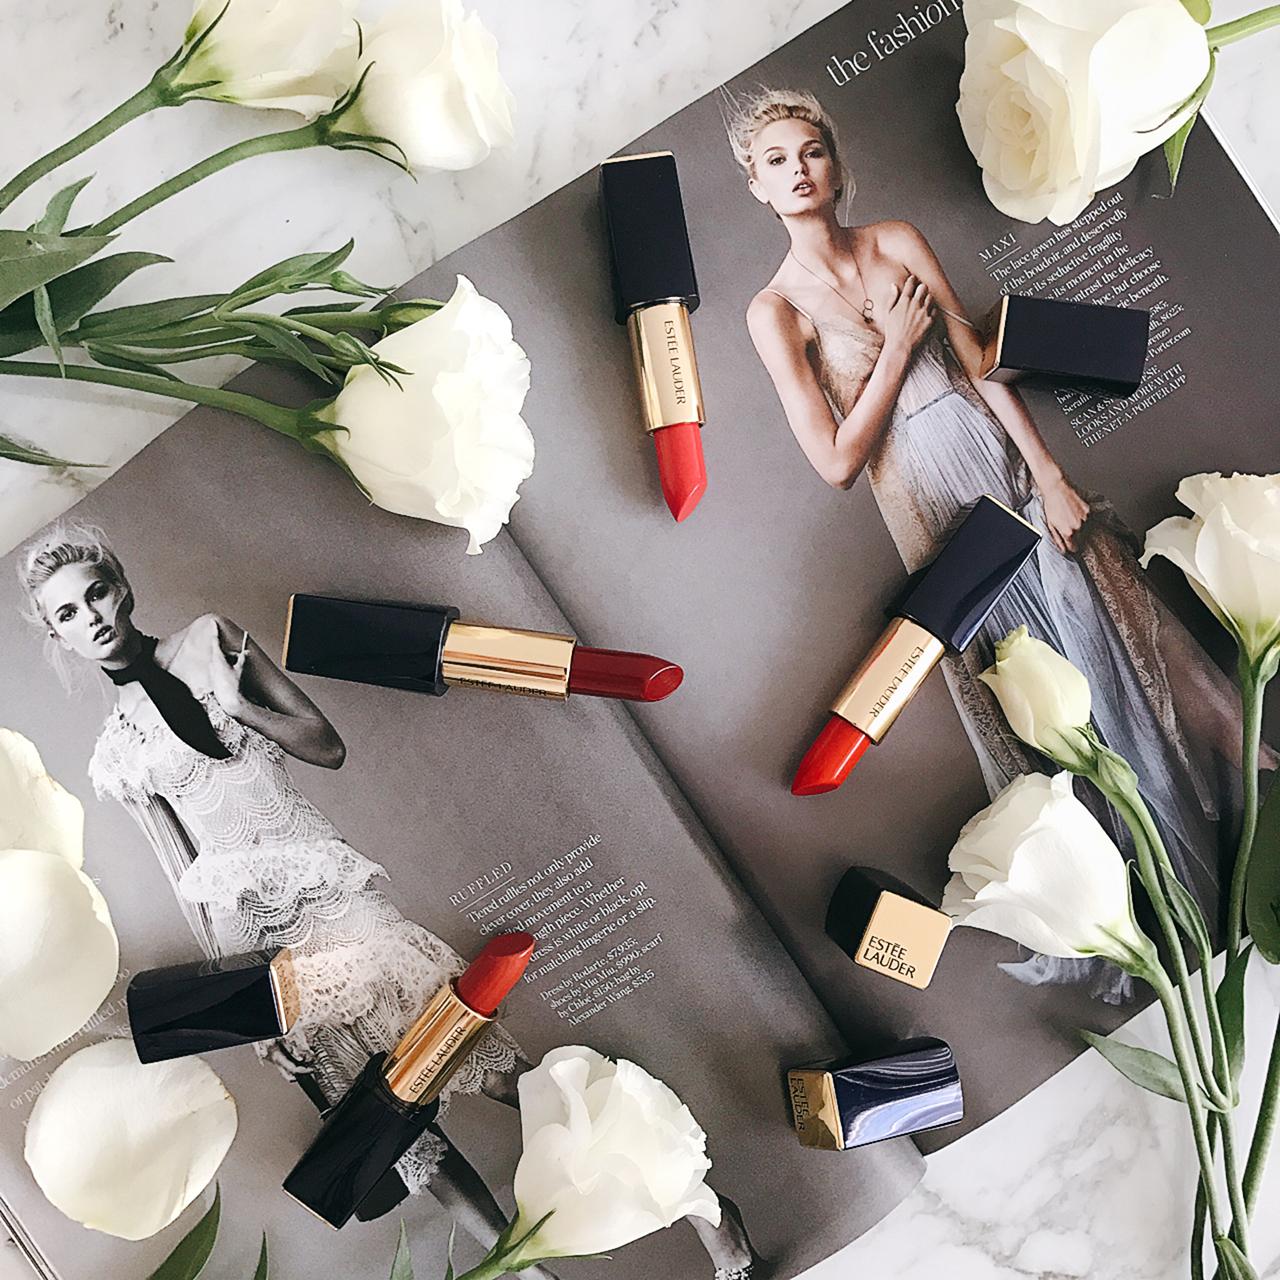 Estee Lauder Pure Color Envy Oil-Infused Sculpting Lipstick